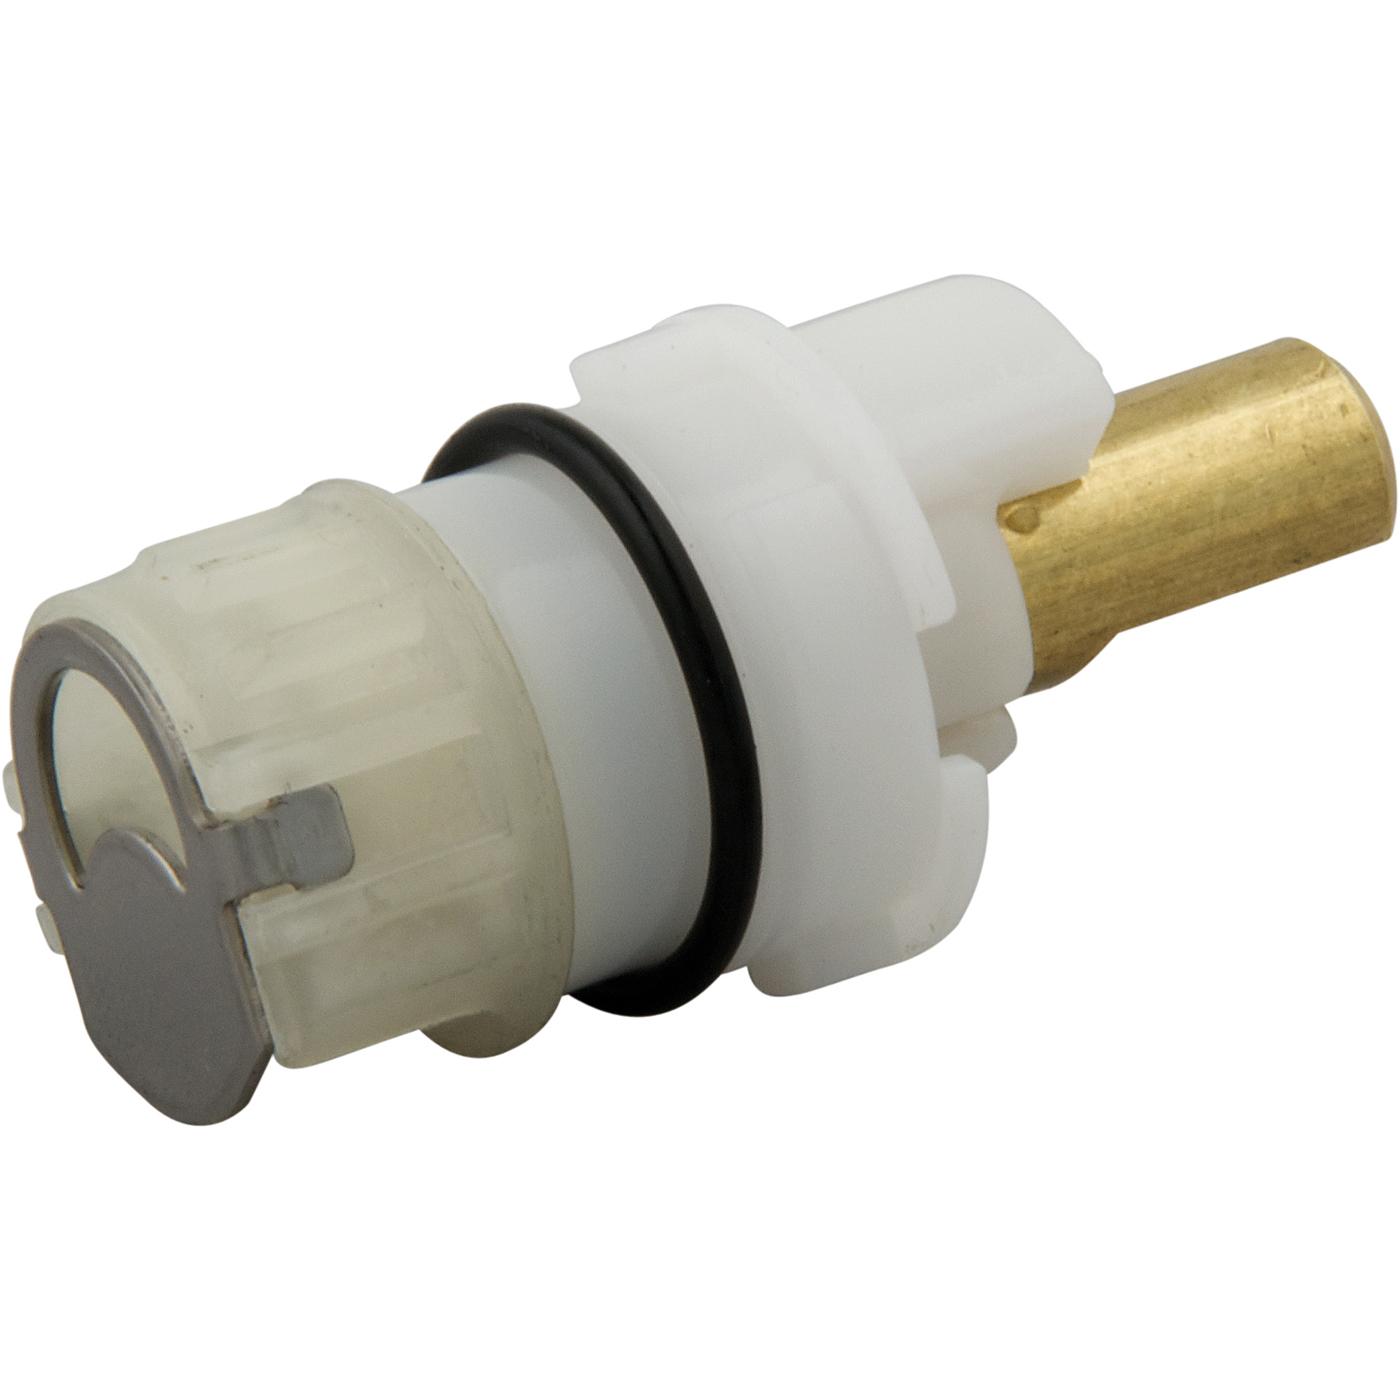 Delta Faucet Cartridge Master Plumber